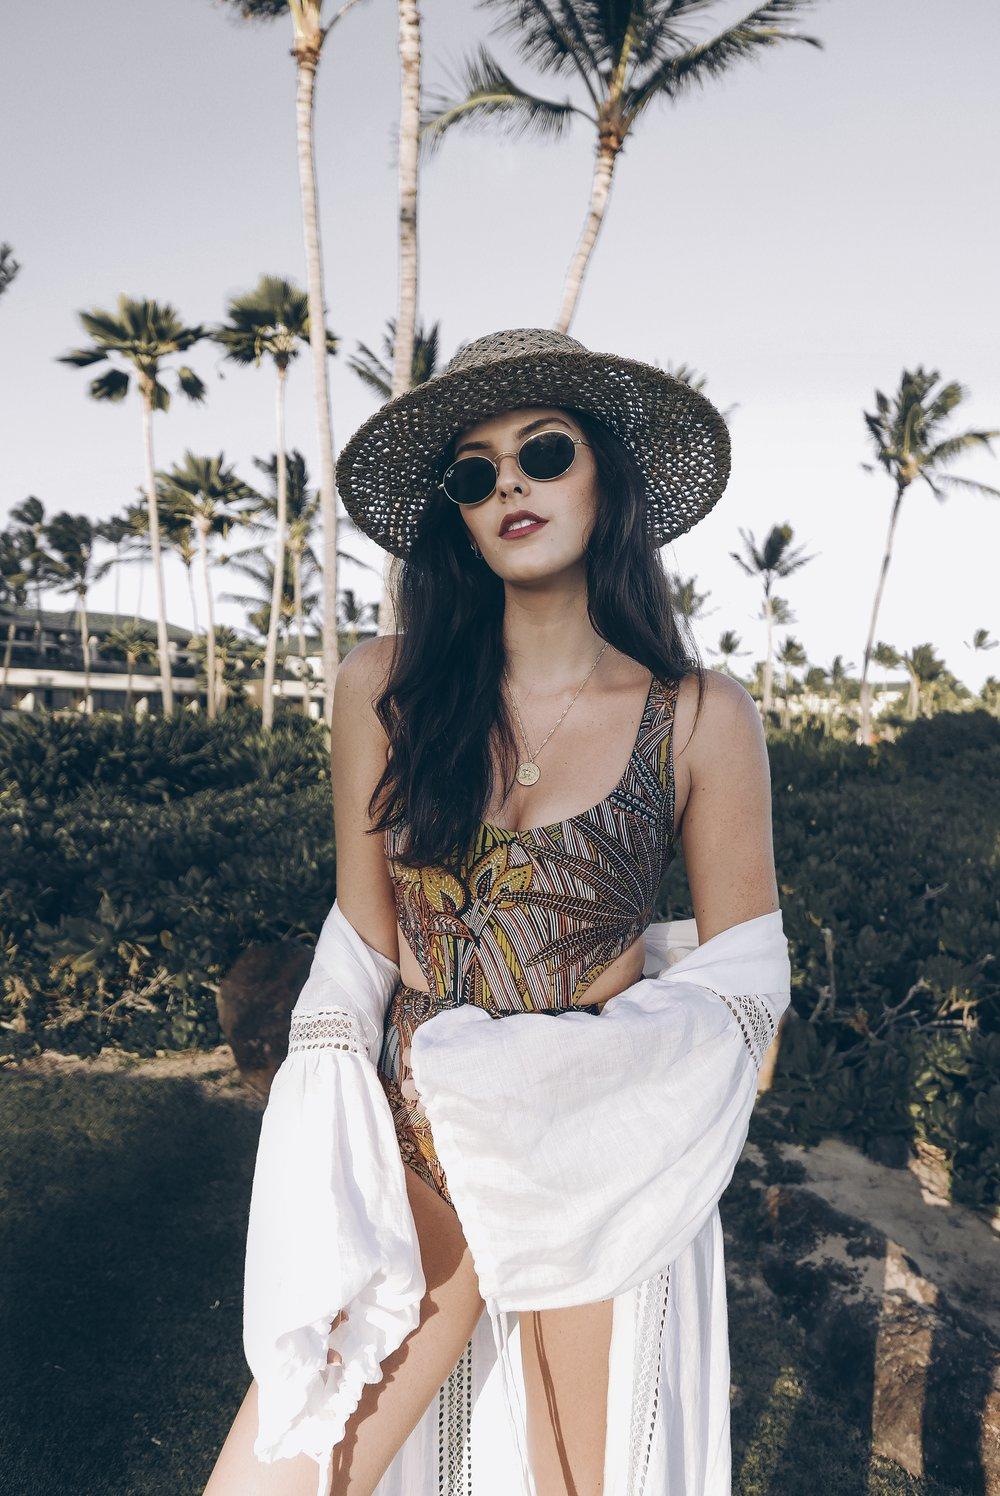 Boho Style L Space Swim - Kauai Travel Guide - Julia Friedman